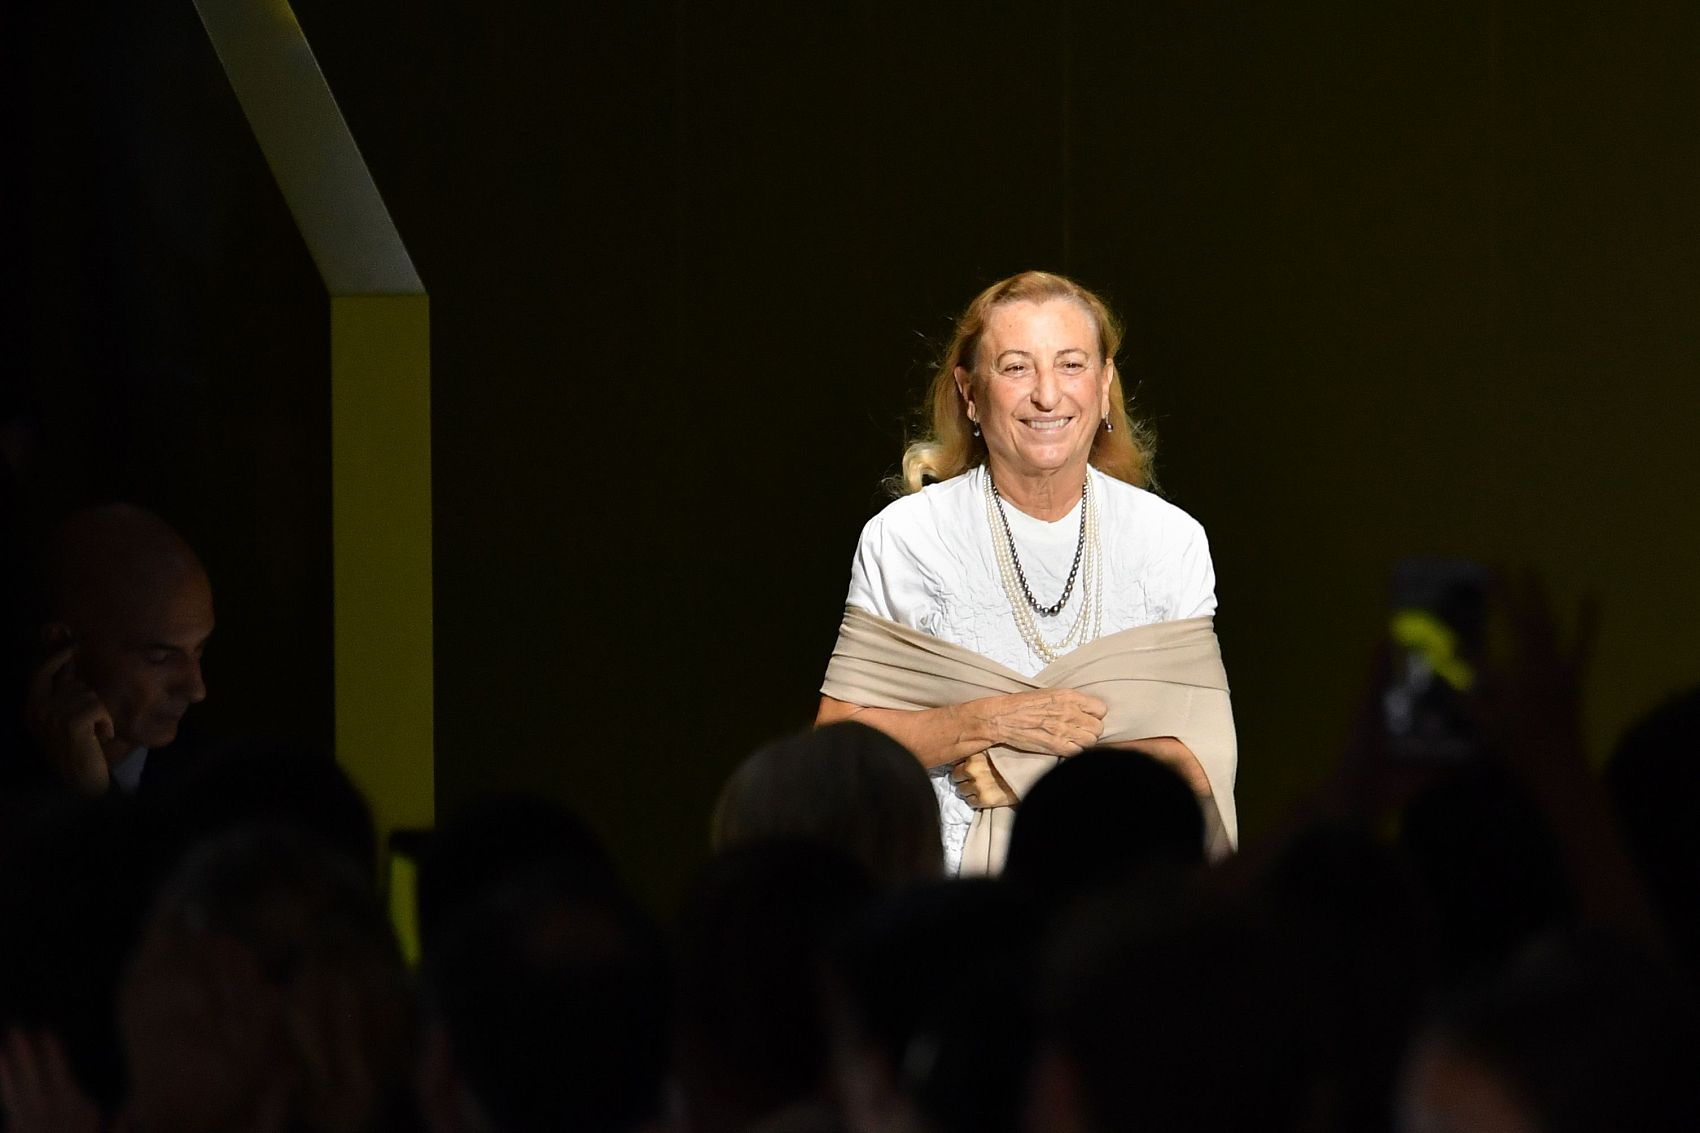 Prada 掌门人 Miuccia Prada 拆分个人投资公司,分别管理产业投资、不动产和艺术投资